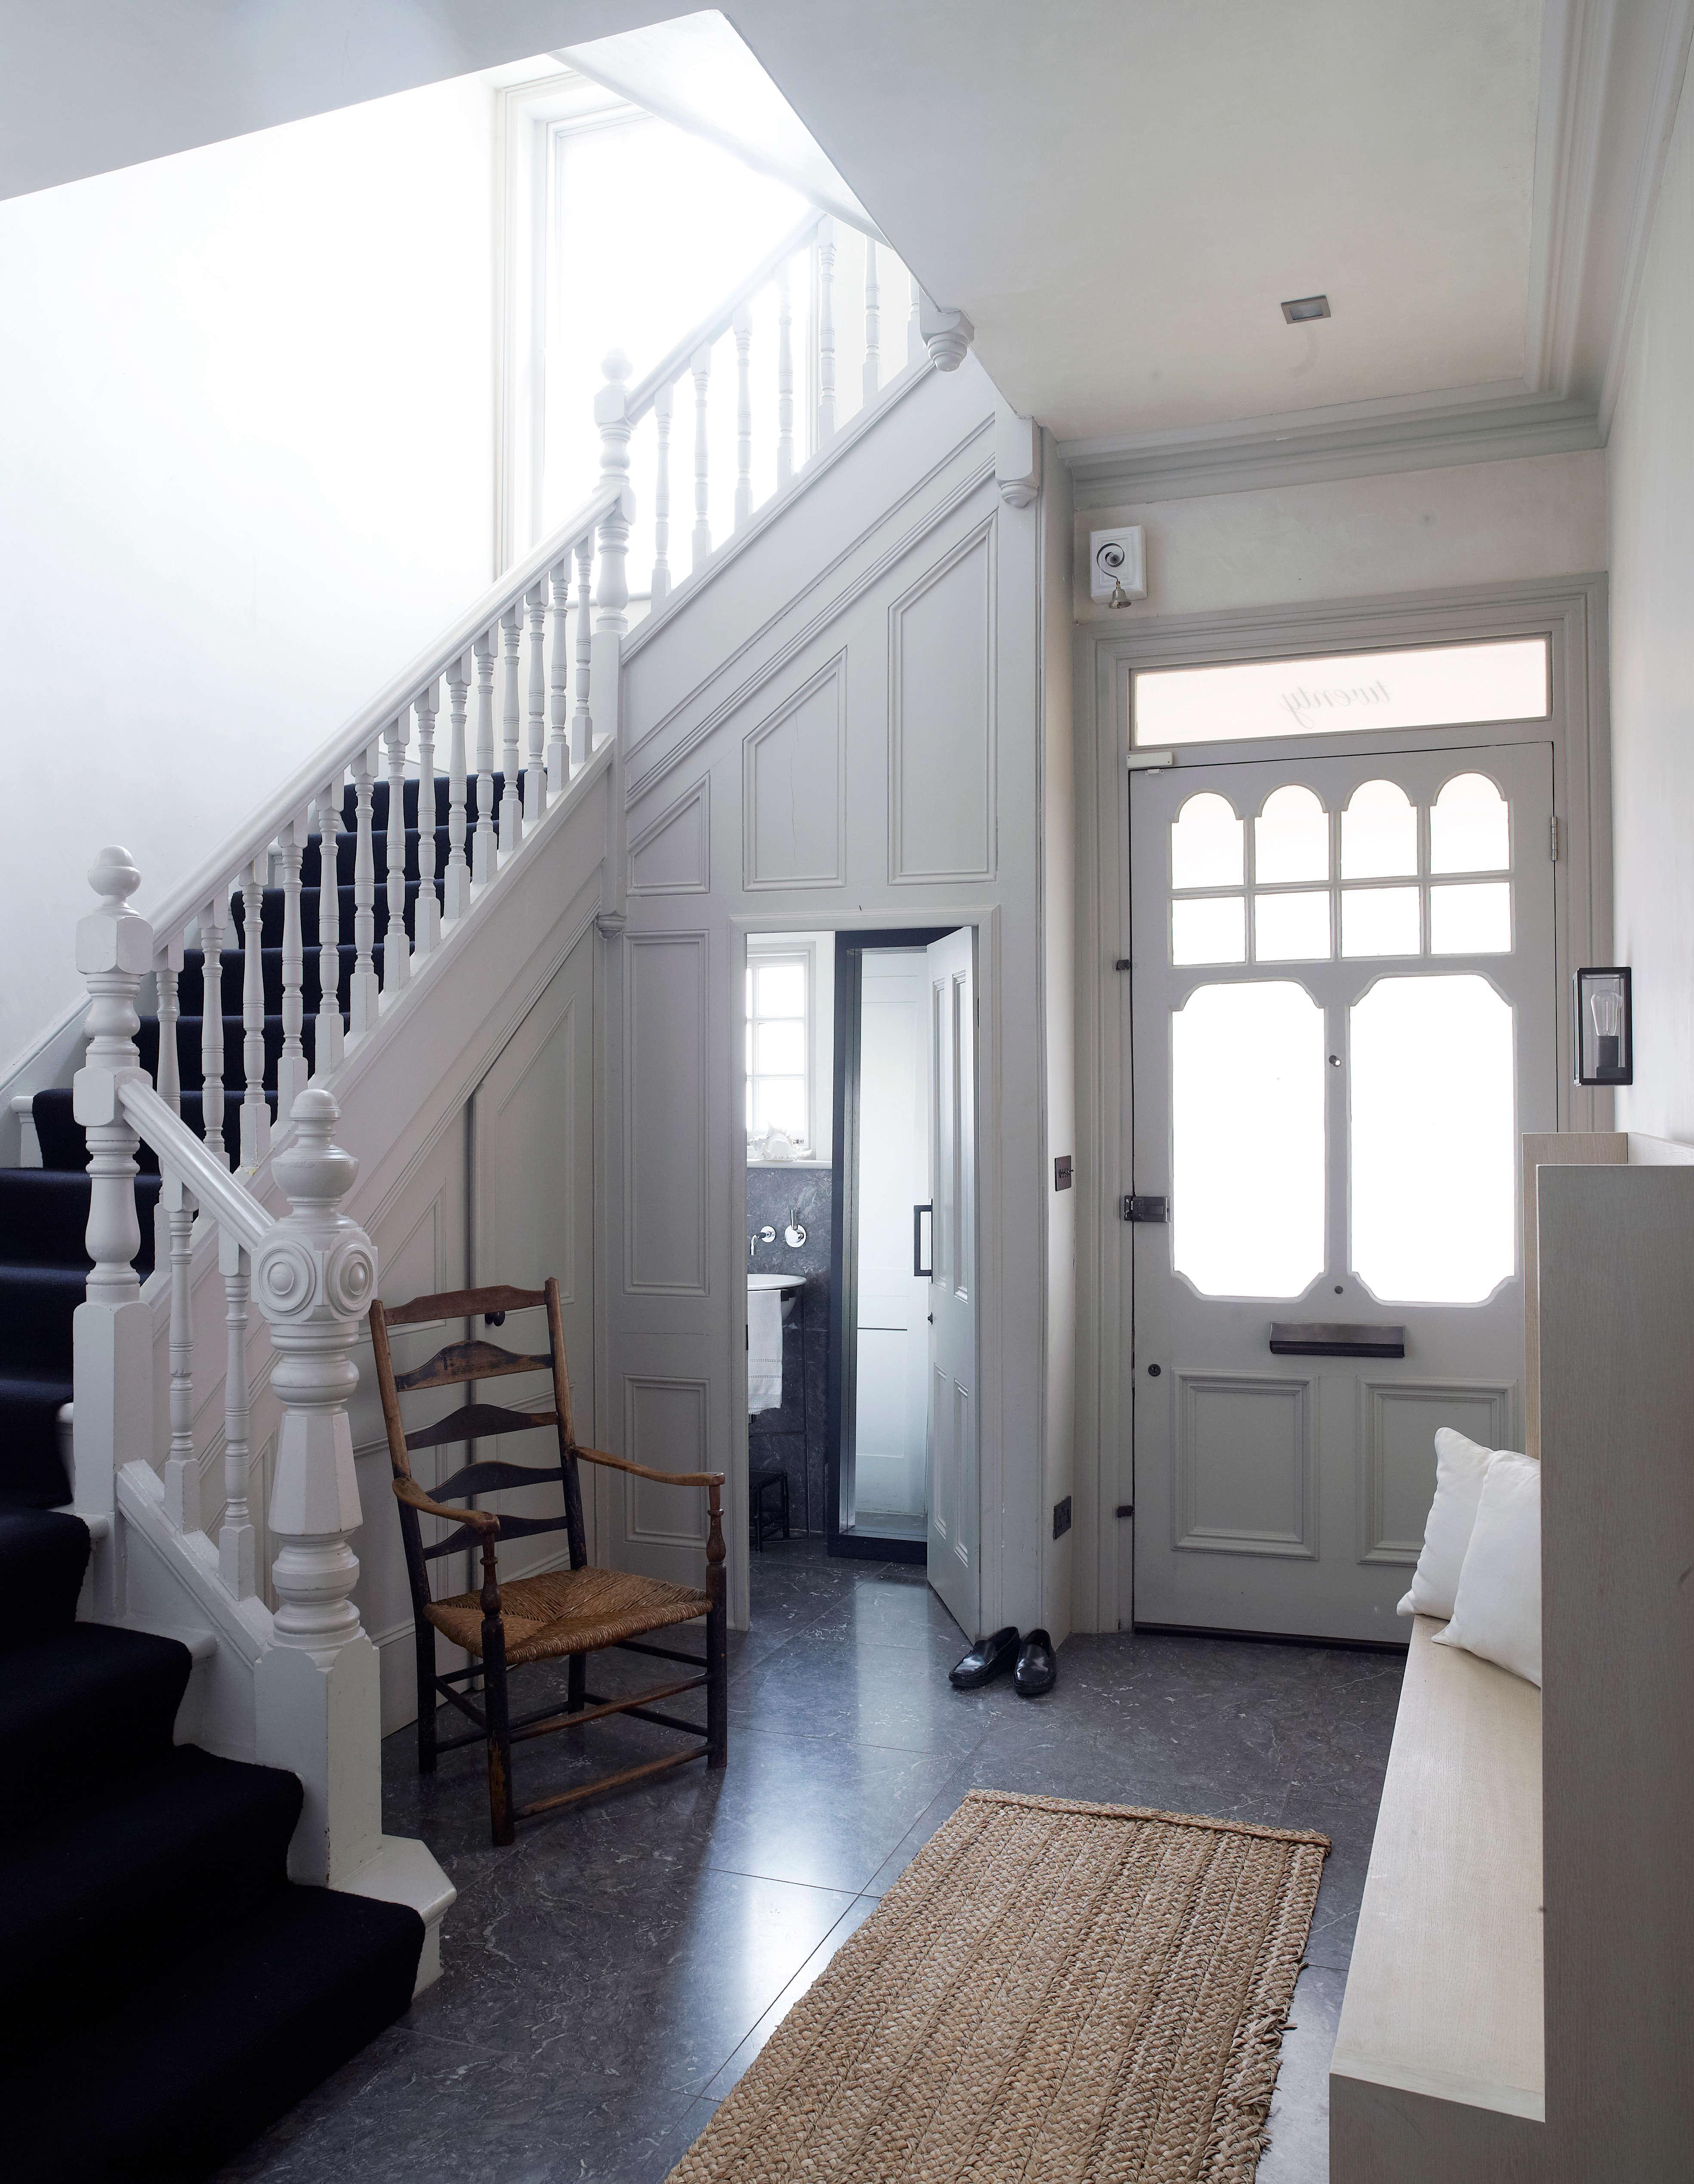 spencer fung house hallway richard powers 9